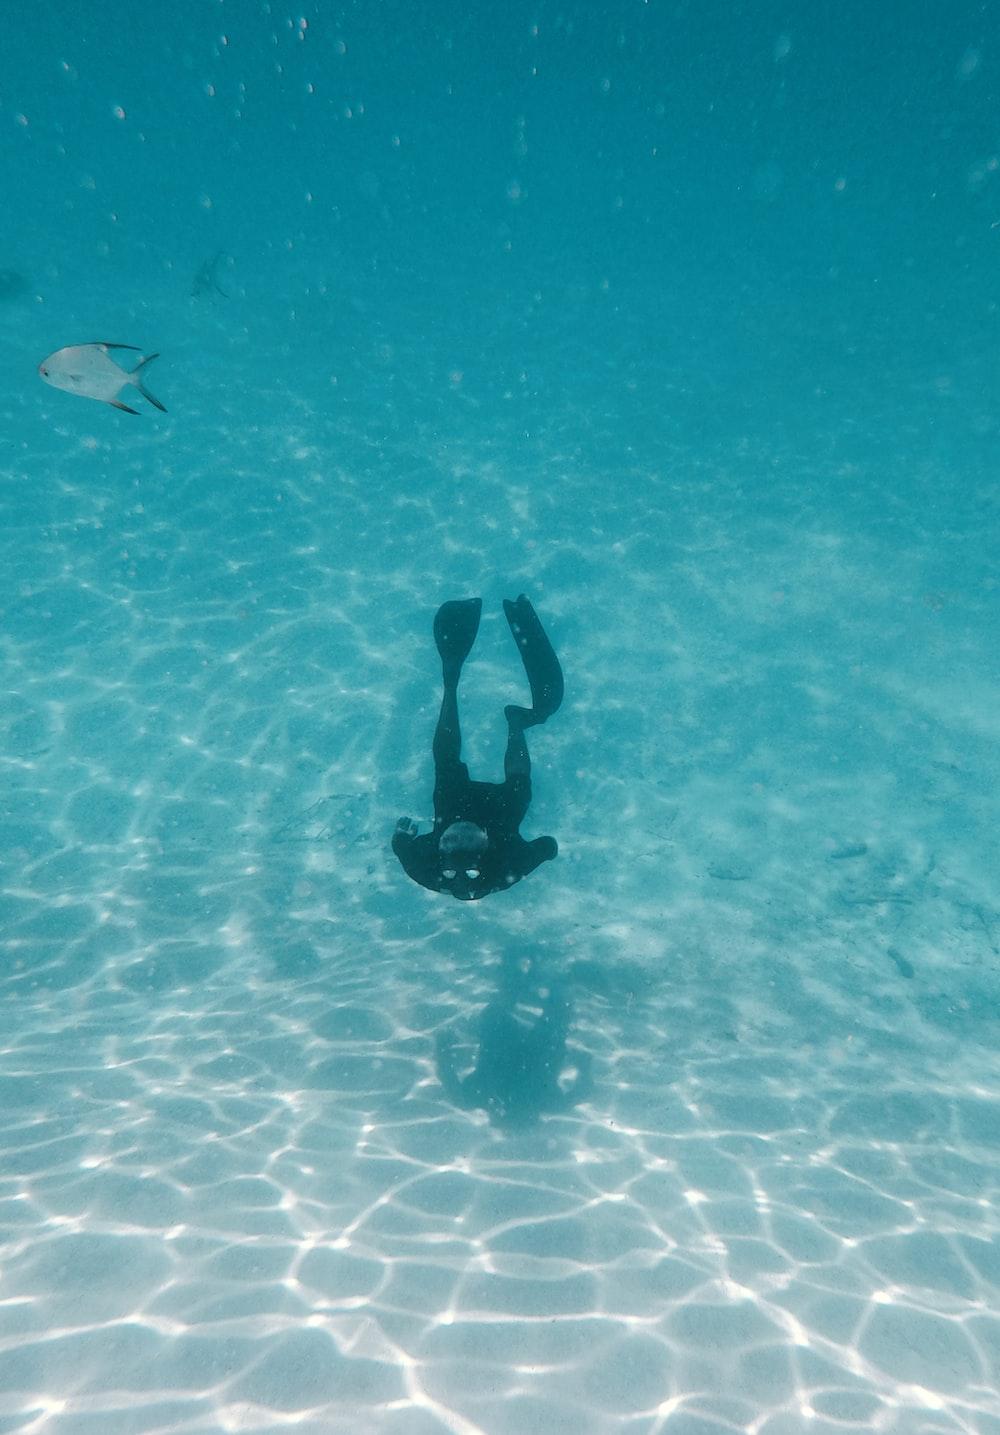 person in black wet suit in water